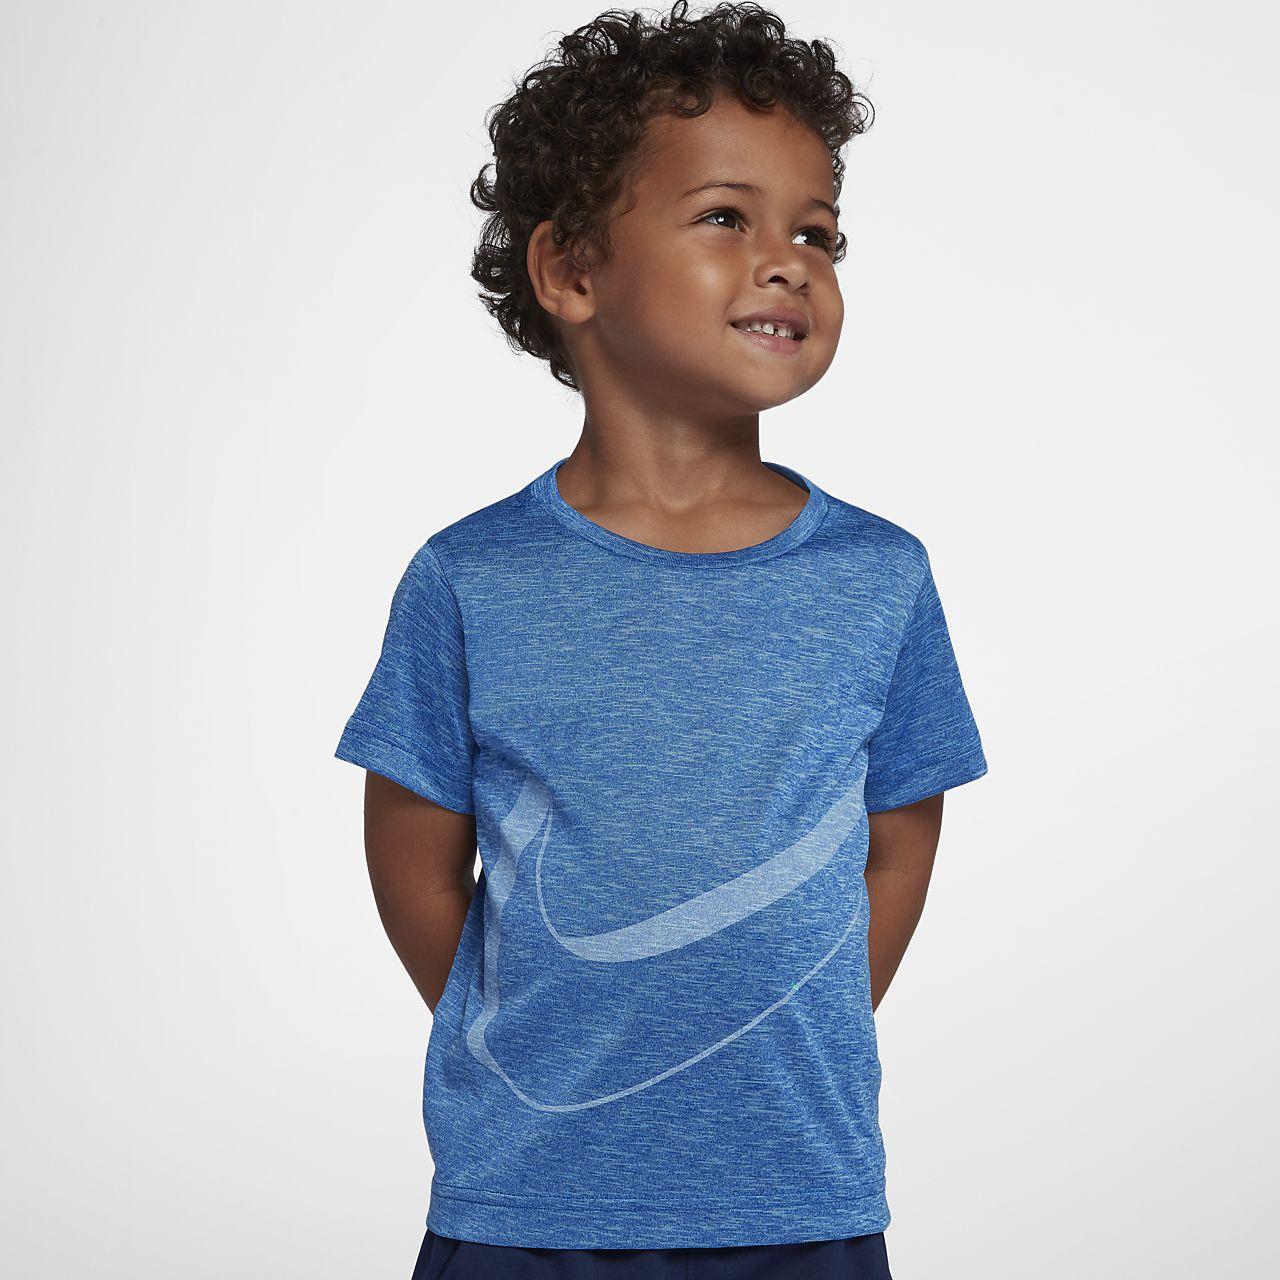 Tee-shirt Nike Breathe pour Jeune enfant